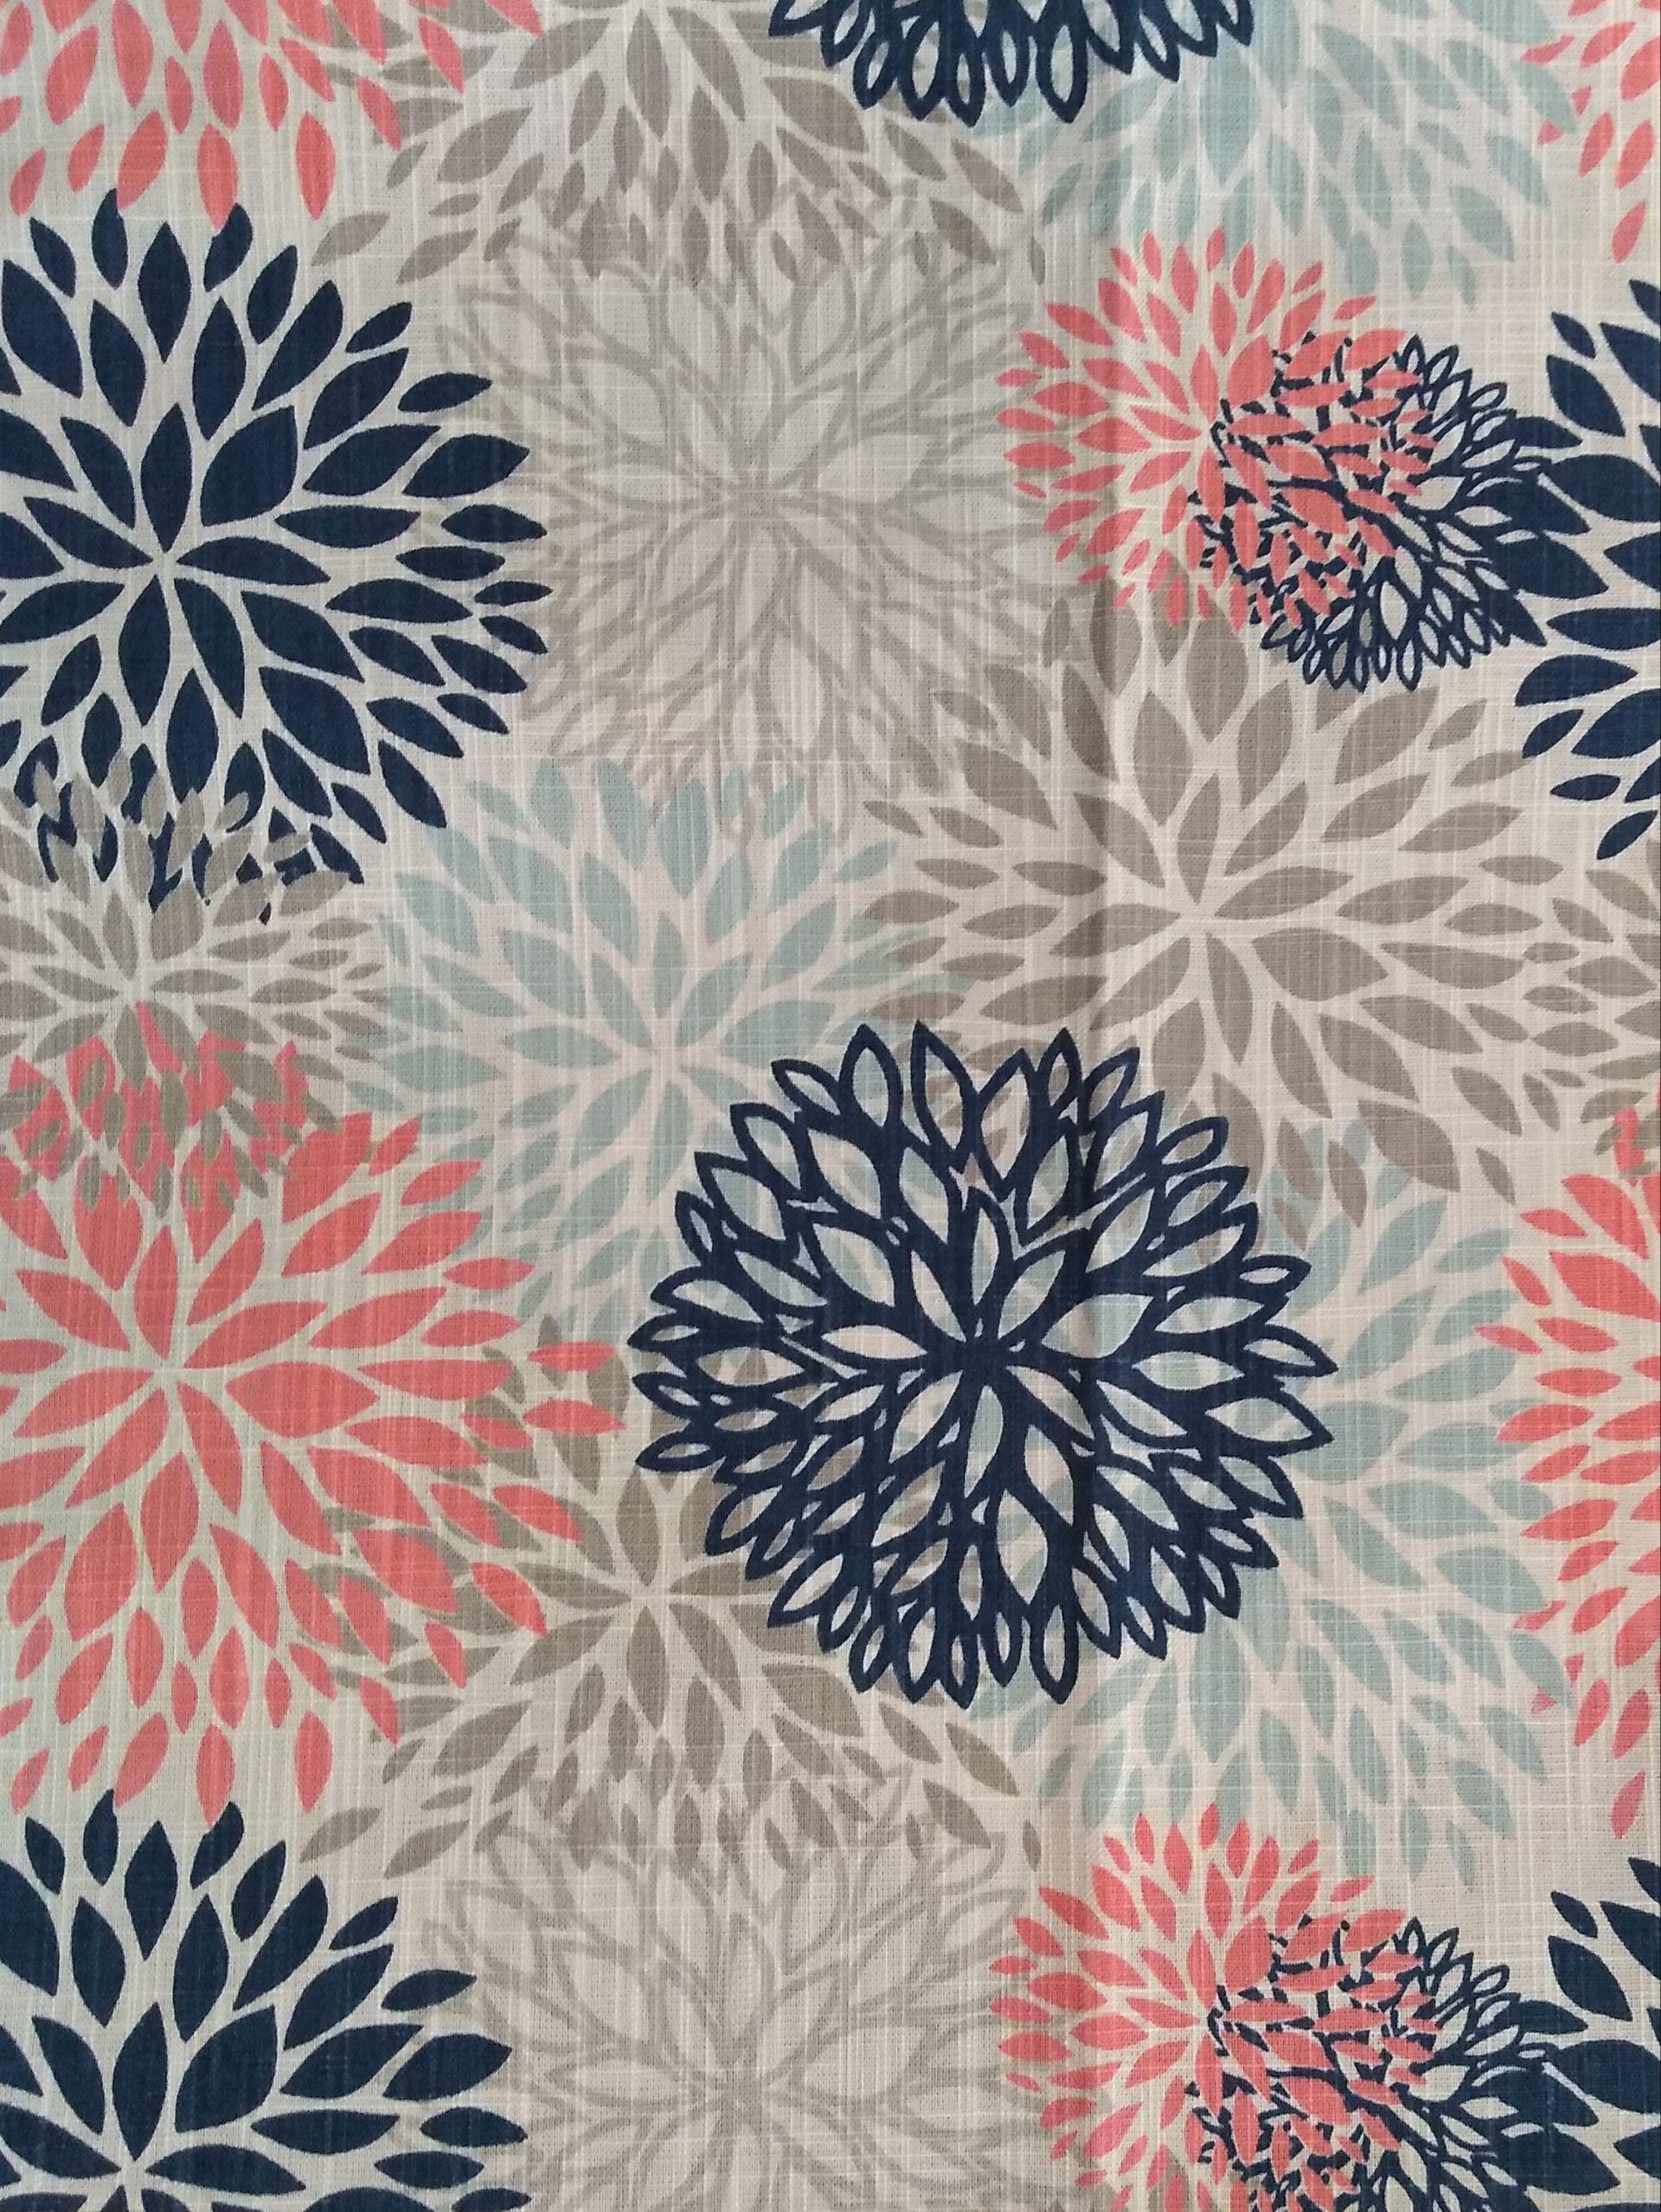 New Arrival Interior Fabric Fabric Fabric Store